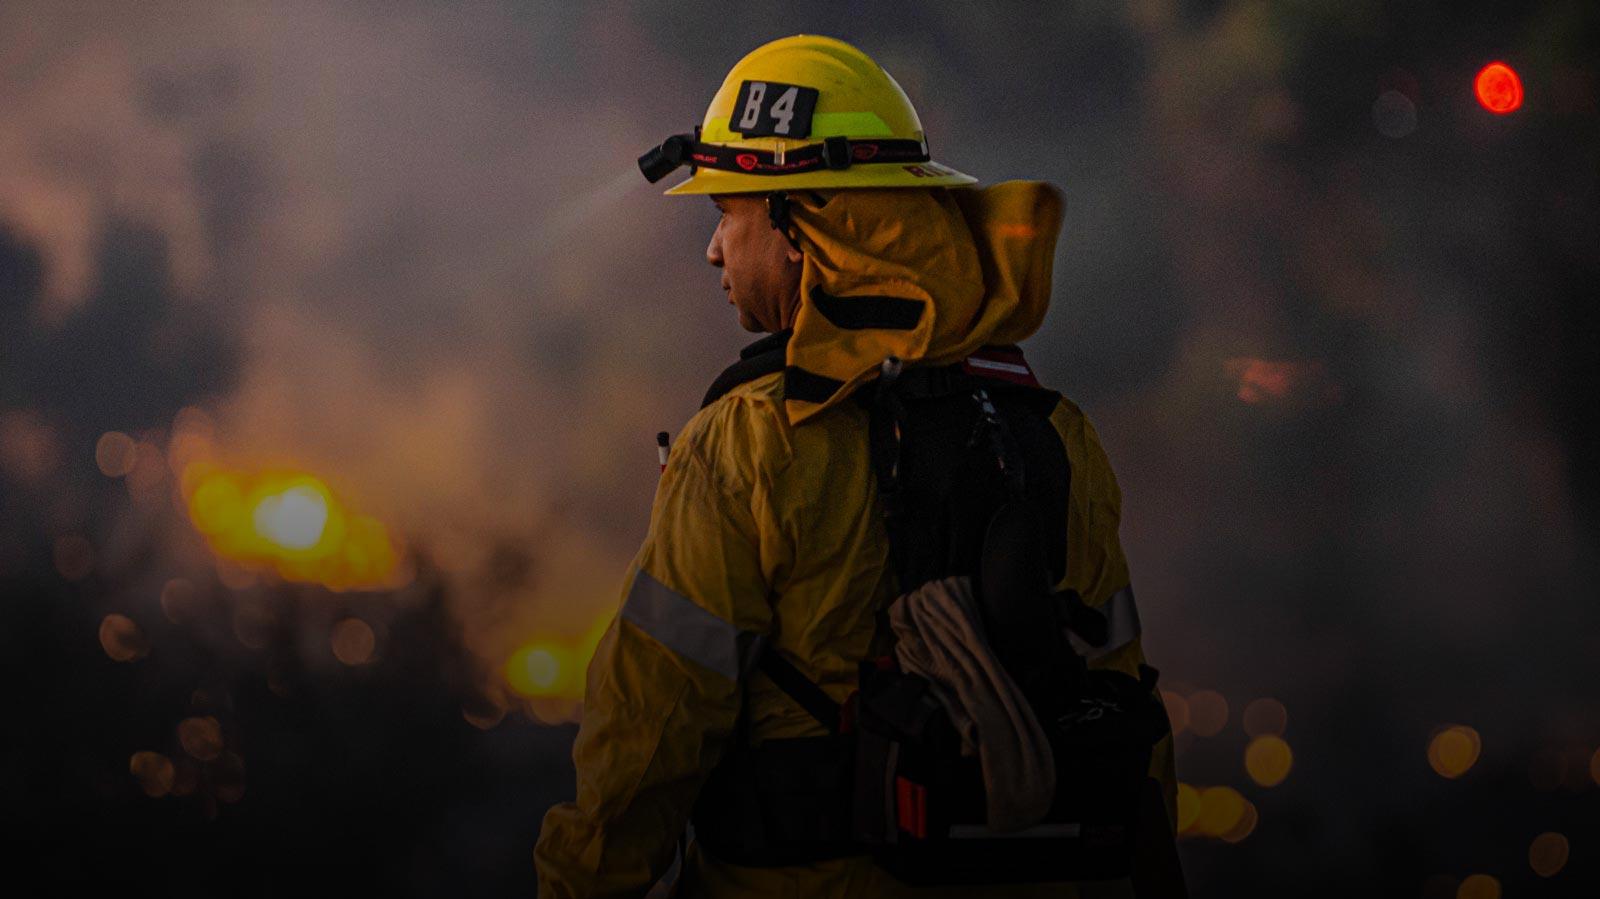 https://iqonboard.com/wp/wp-content/uploads/2020/03/fire-crew-1.jpg